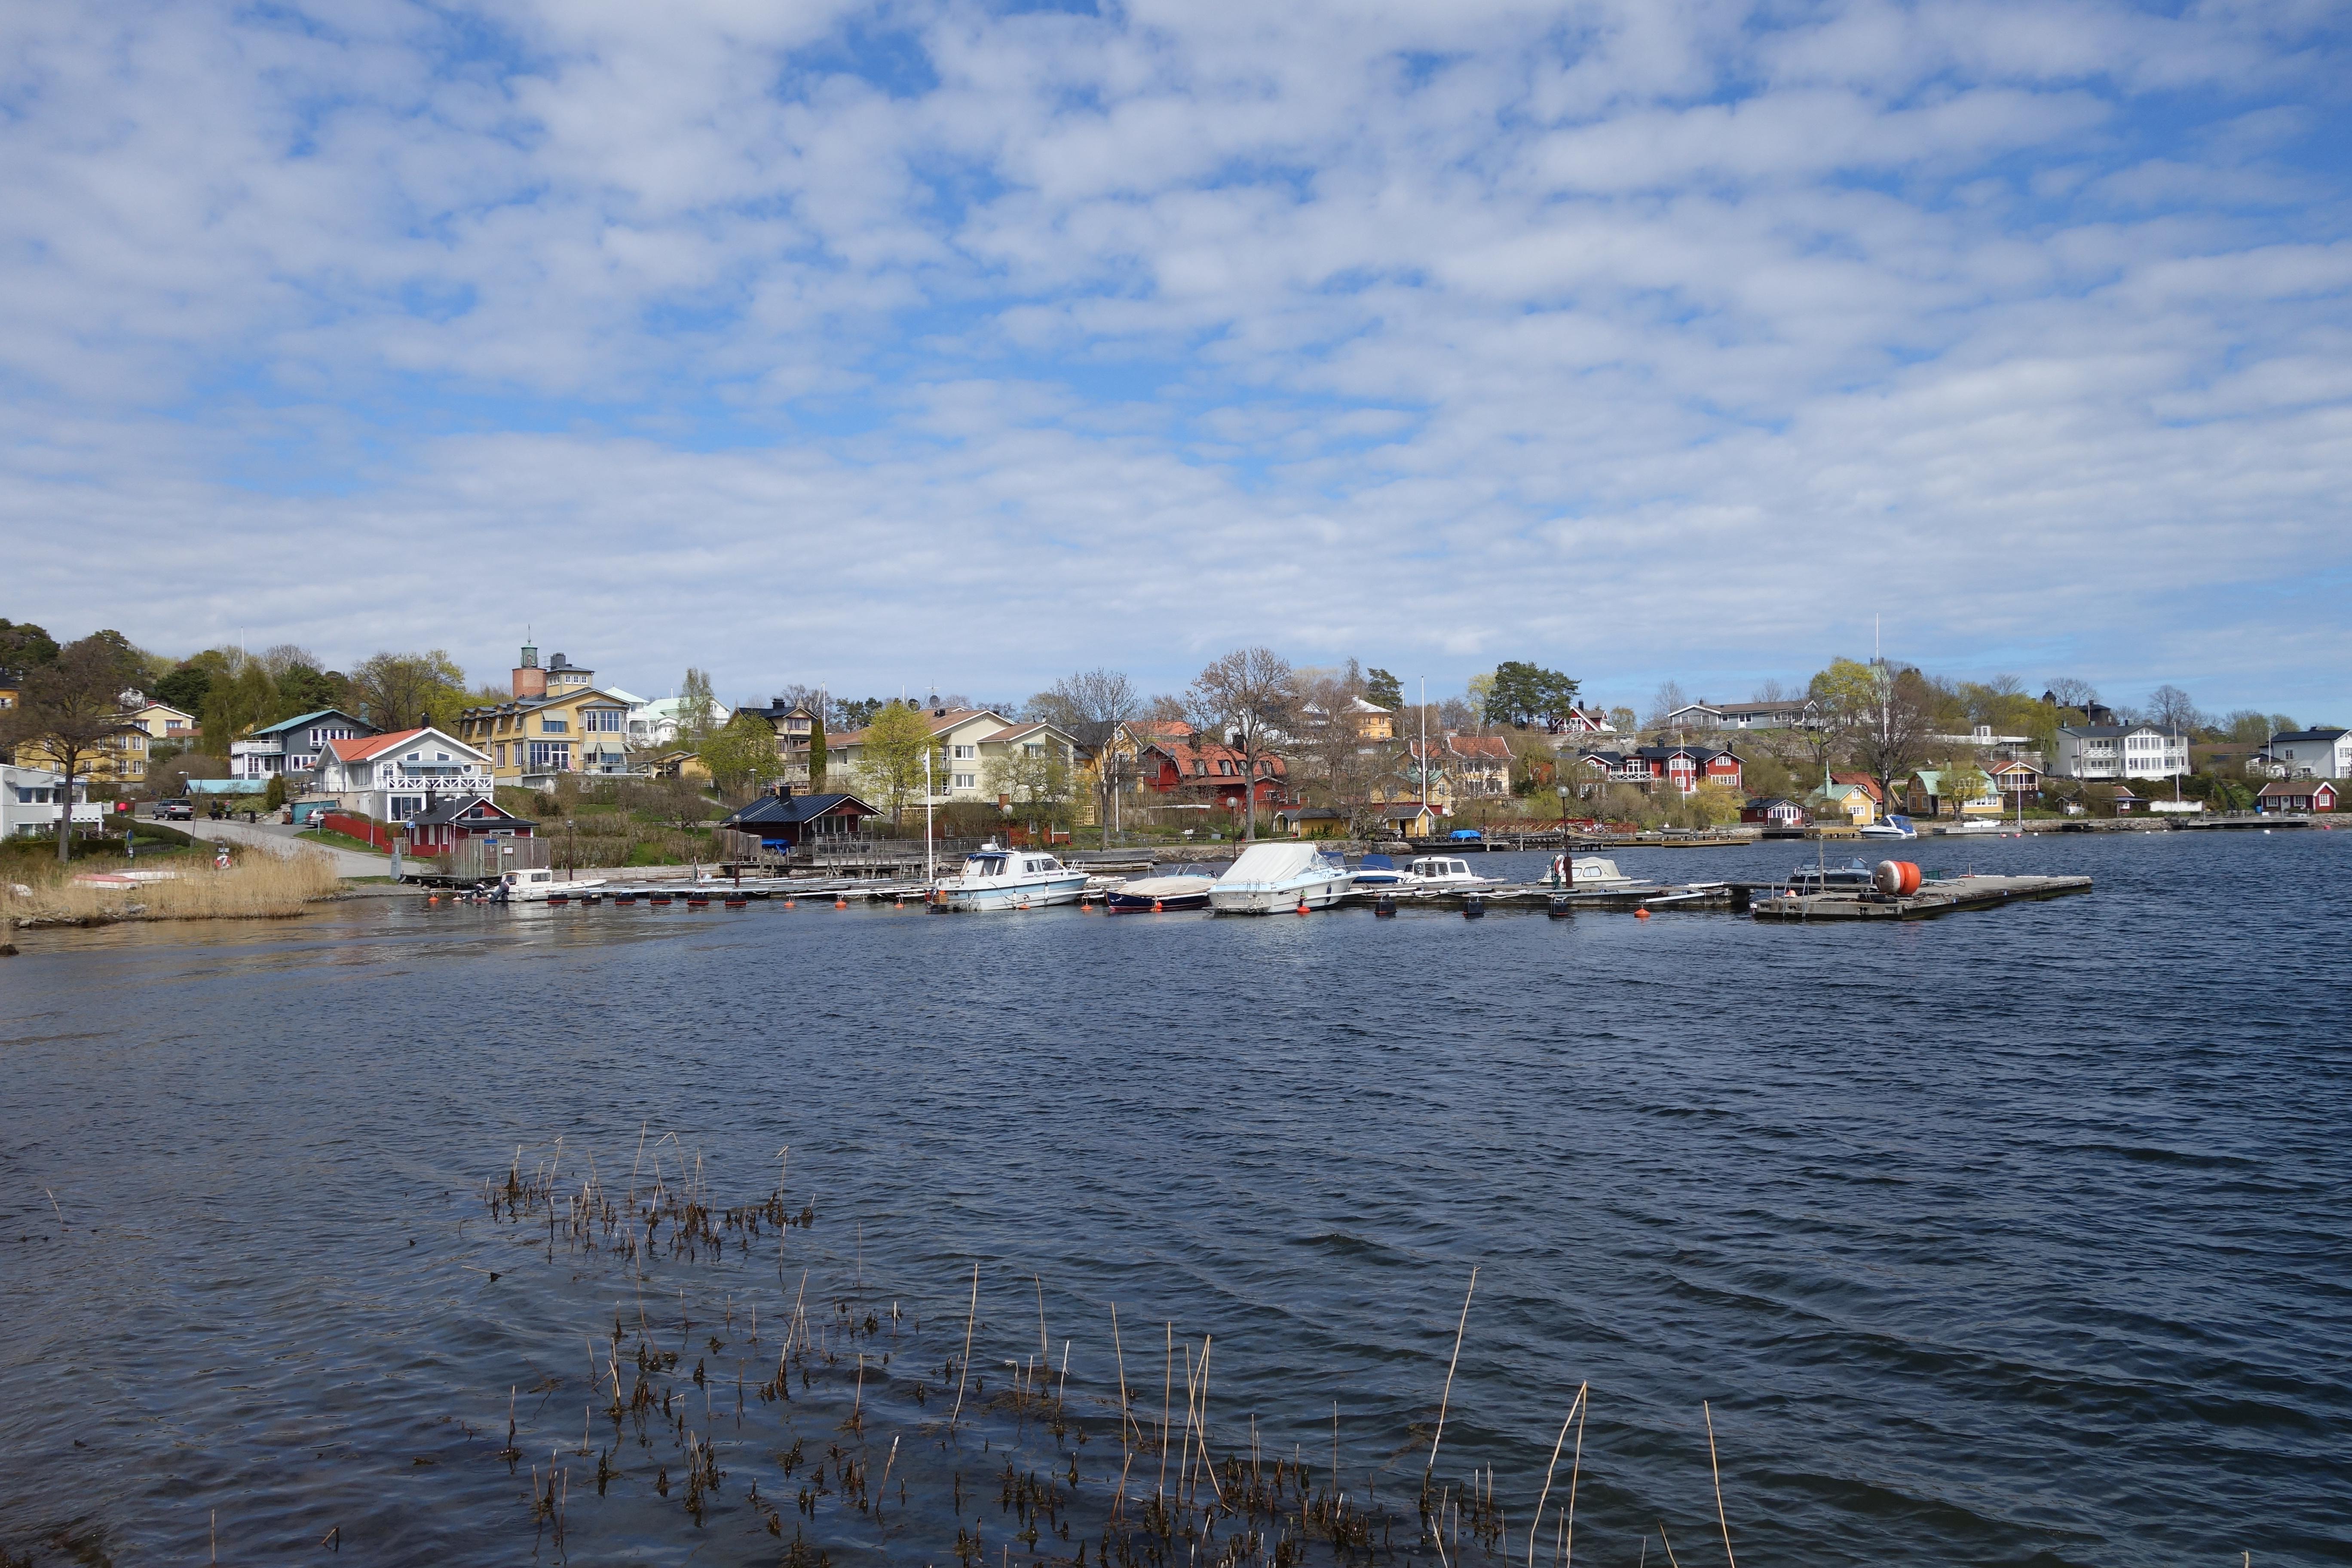 Visiter les iles de Vaxholm